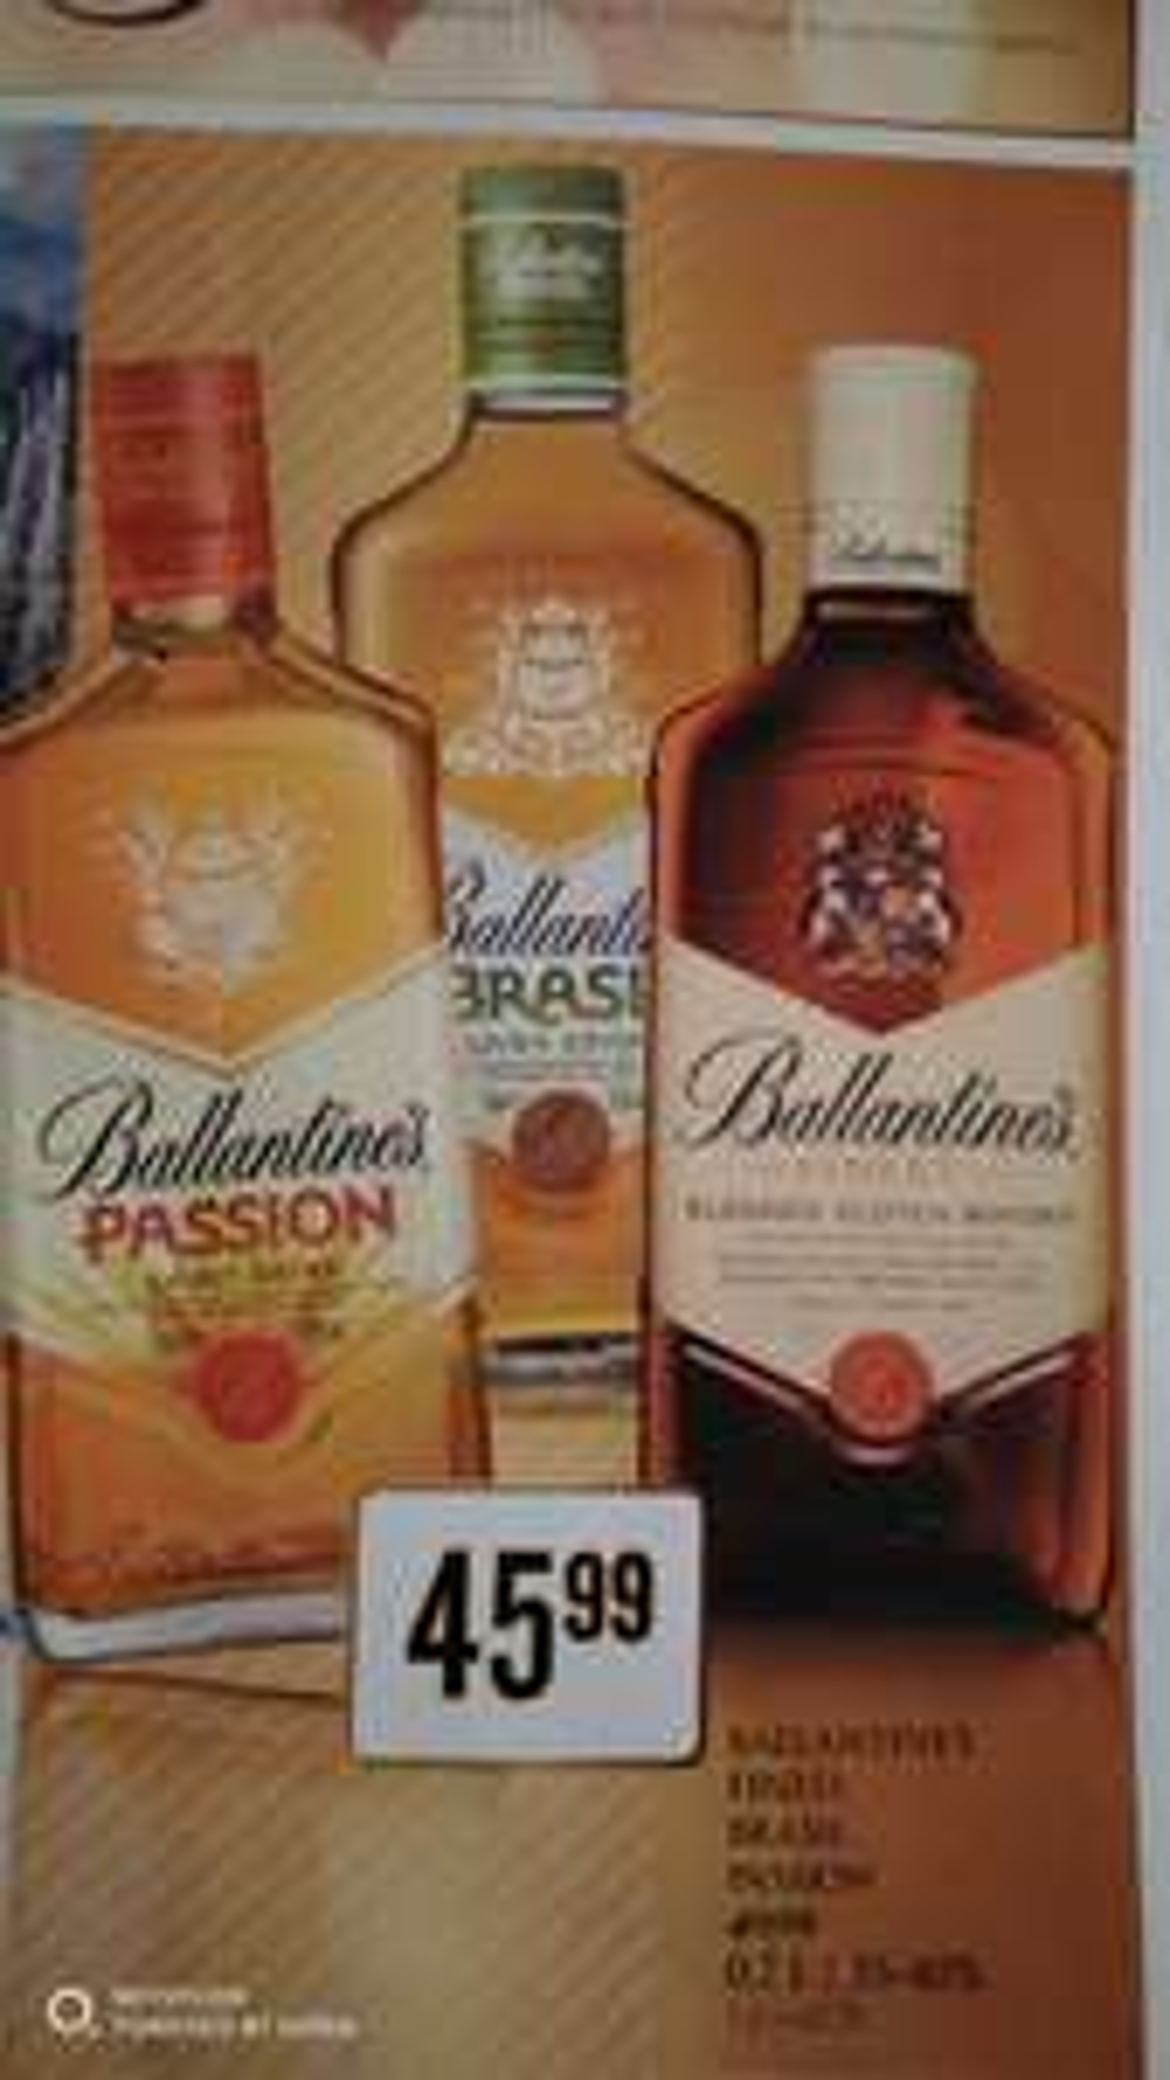 Ballantines 0,7L *PASSION* *BRASIL* *FINEST* | 1litrowy Finest za 54,99pln | 0,7L 12Years za 79,99 | Ballantine's whisky whiskey sklepy Dino